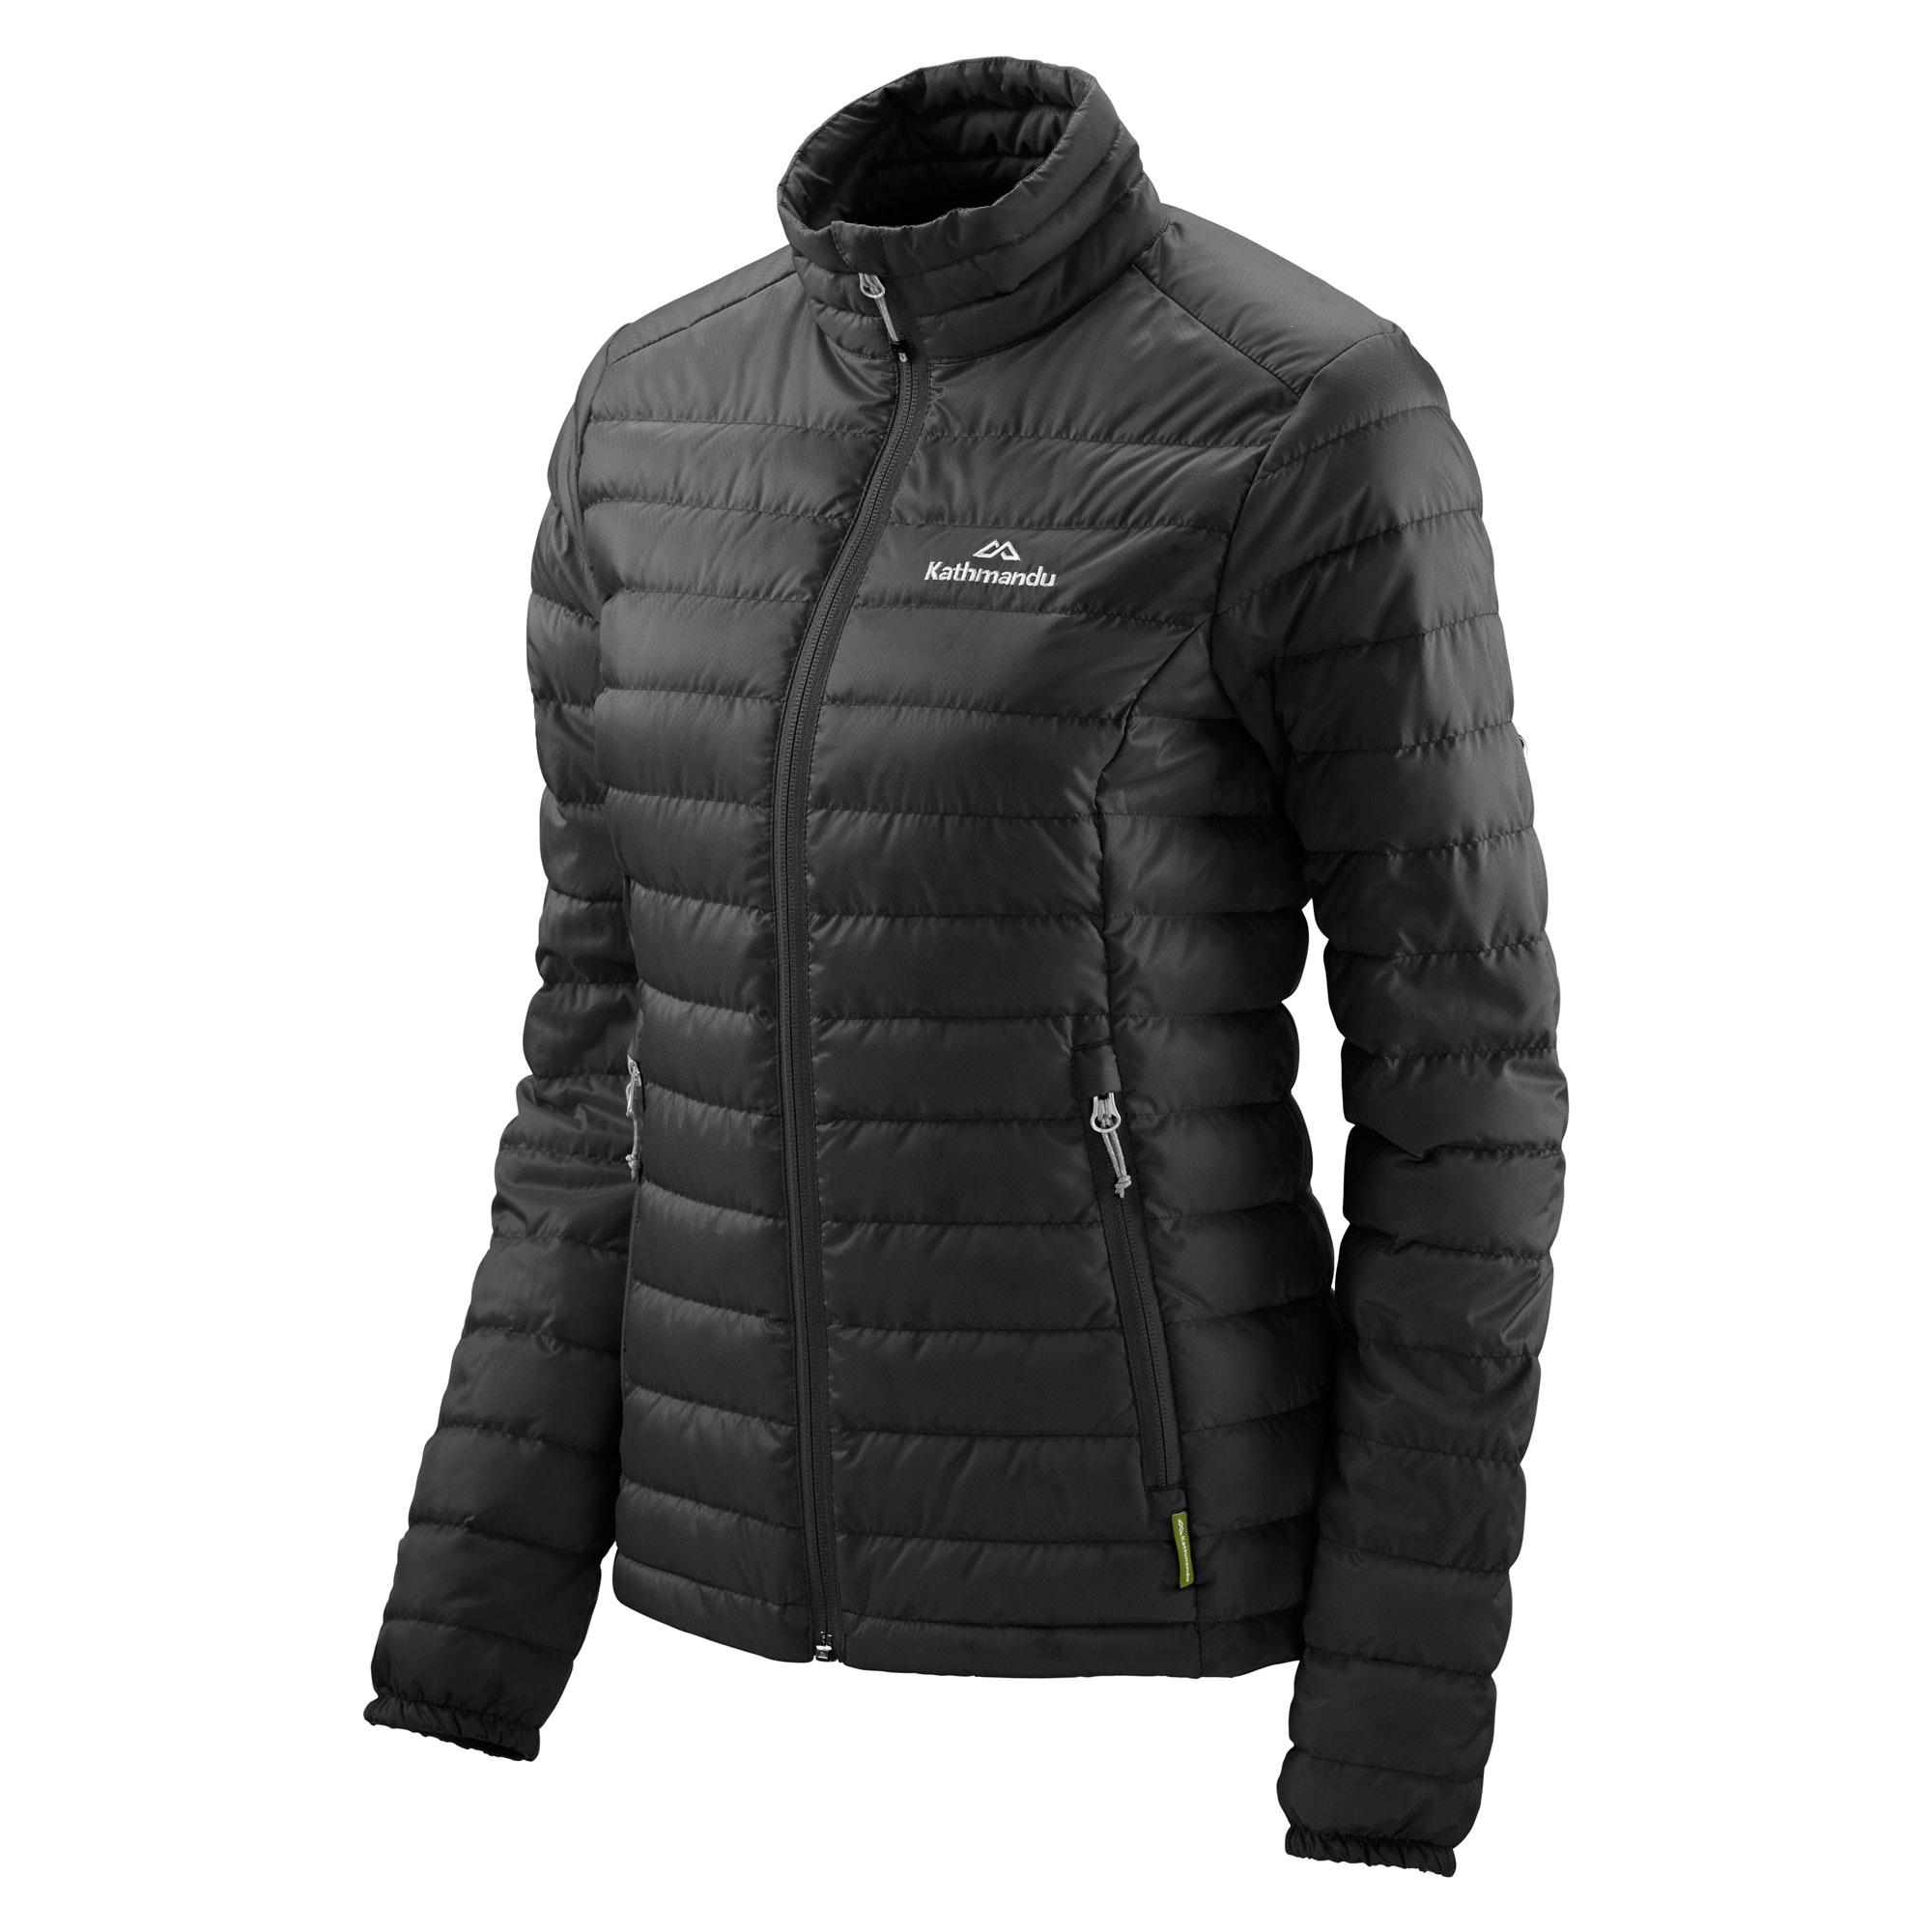 NEW-Kathmandu-Heli-Women-039-s-Lightweight-Duck-Down-Coat-Warm-Puffer-Jacket-v2